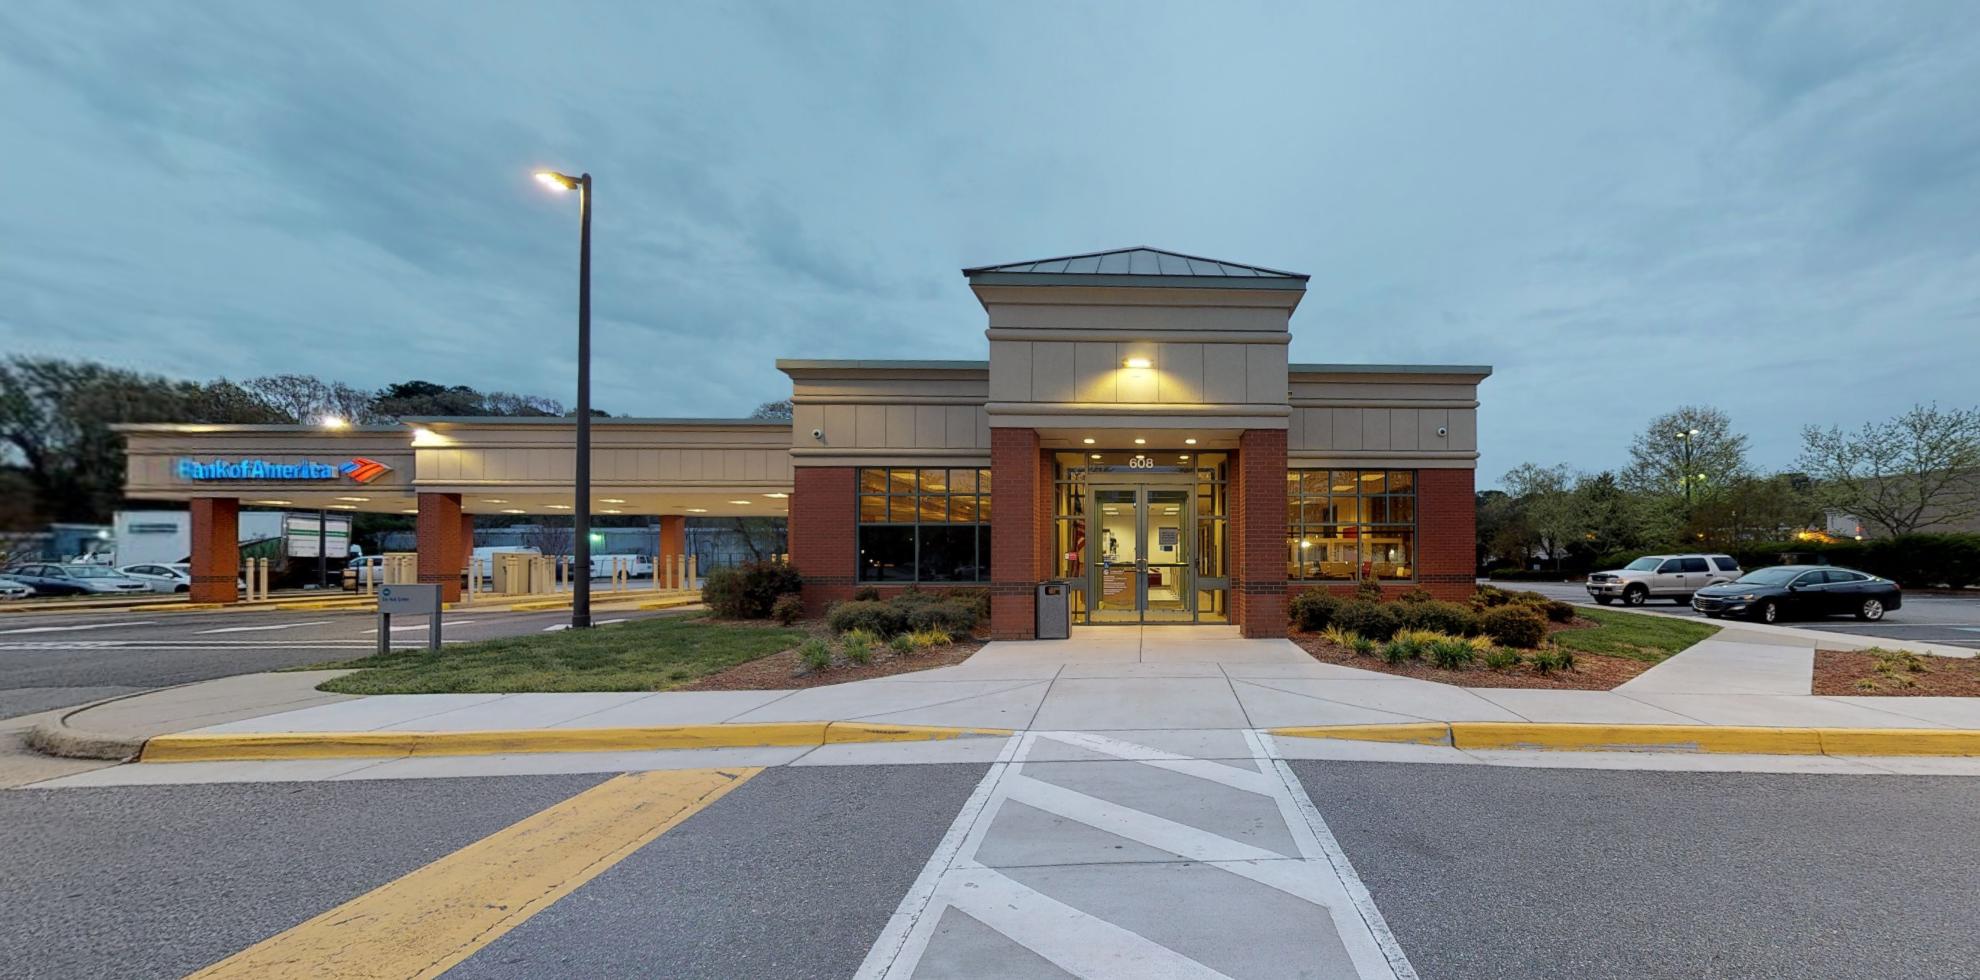 Bank of America financial center with drive-thru ATM | 608 J Clyde Morris Blvd, Newport News, VA 23601